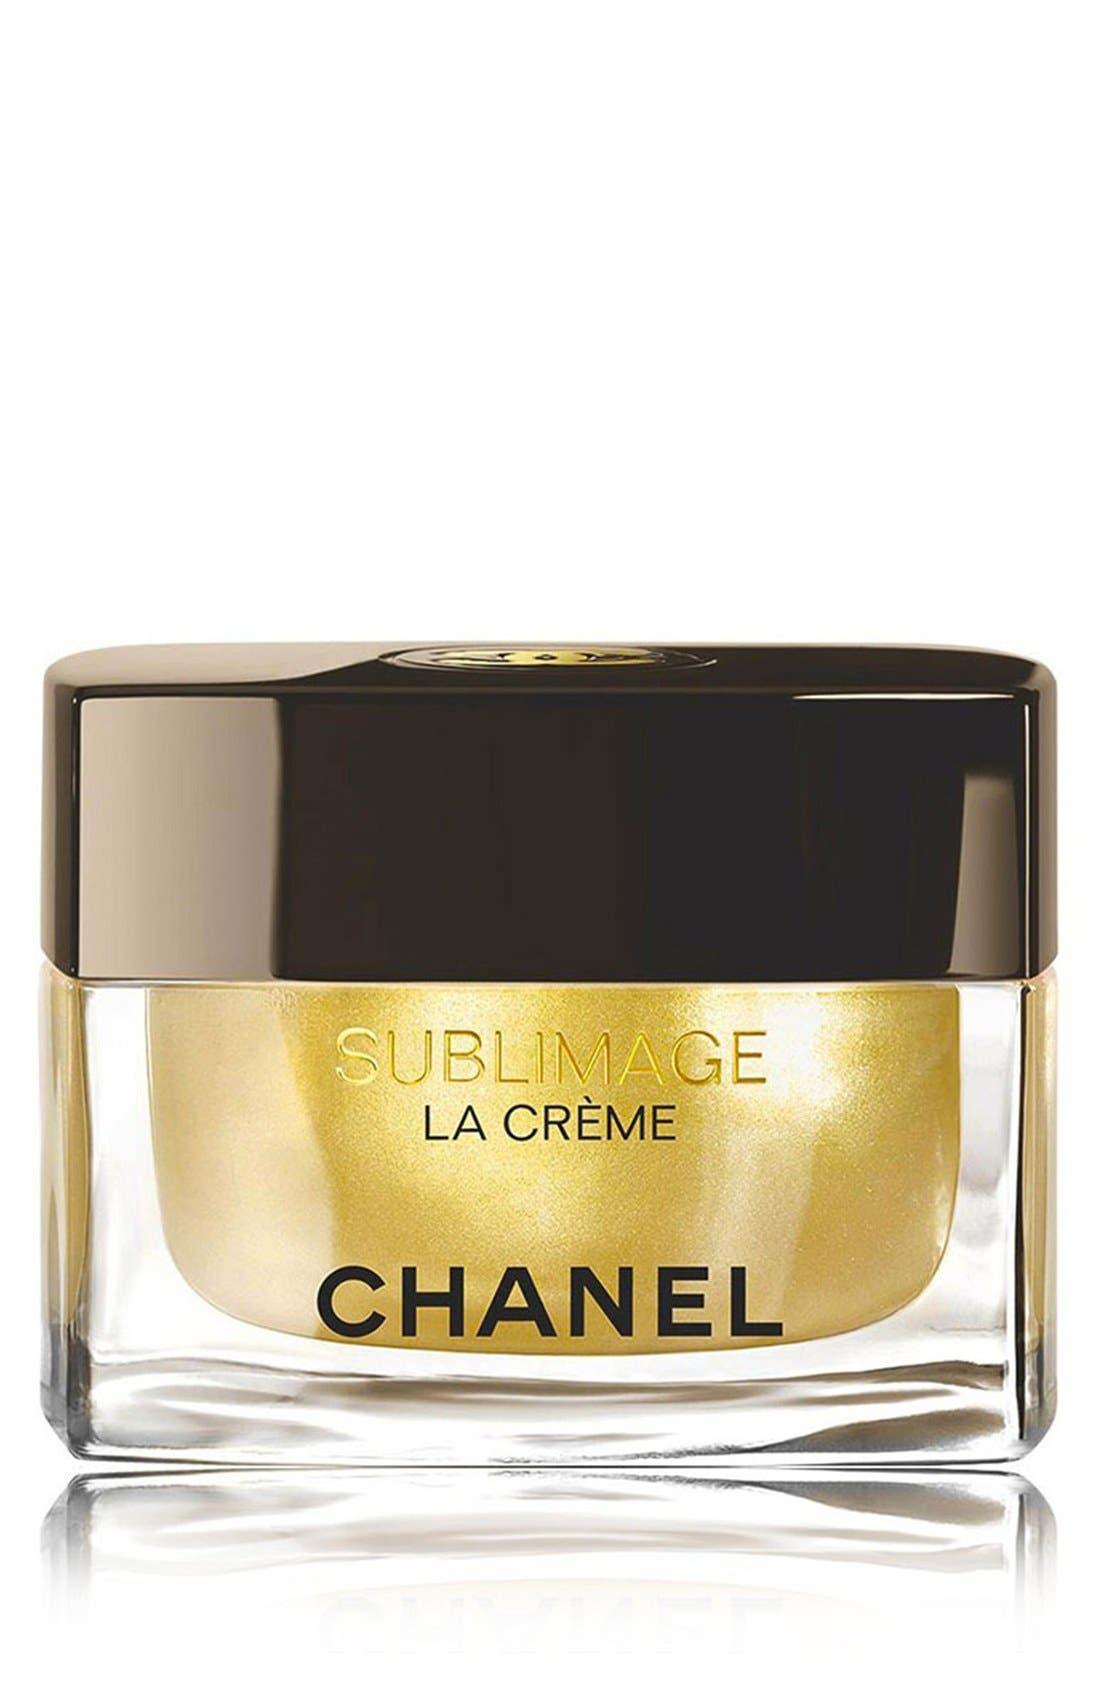 SUBLIMAGE LA CRÈME<br />Ultimate Skin Regeneration,                         Main,                         color, 000